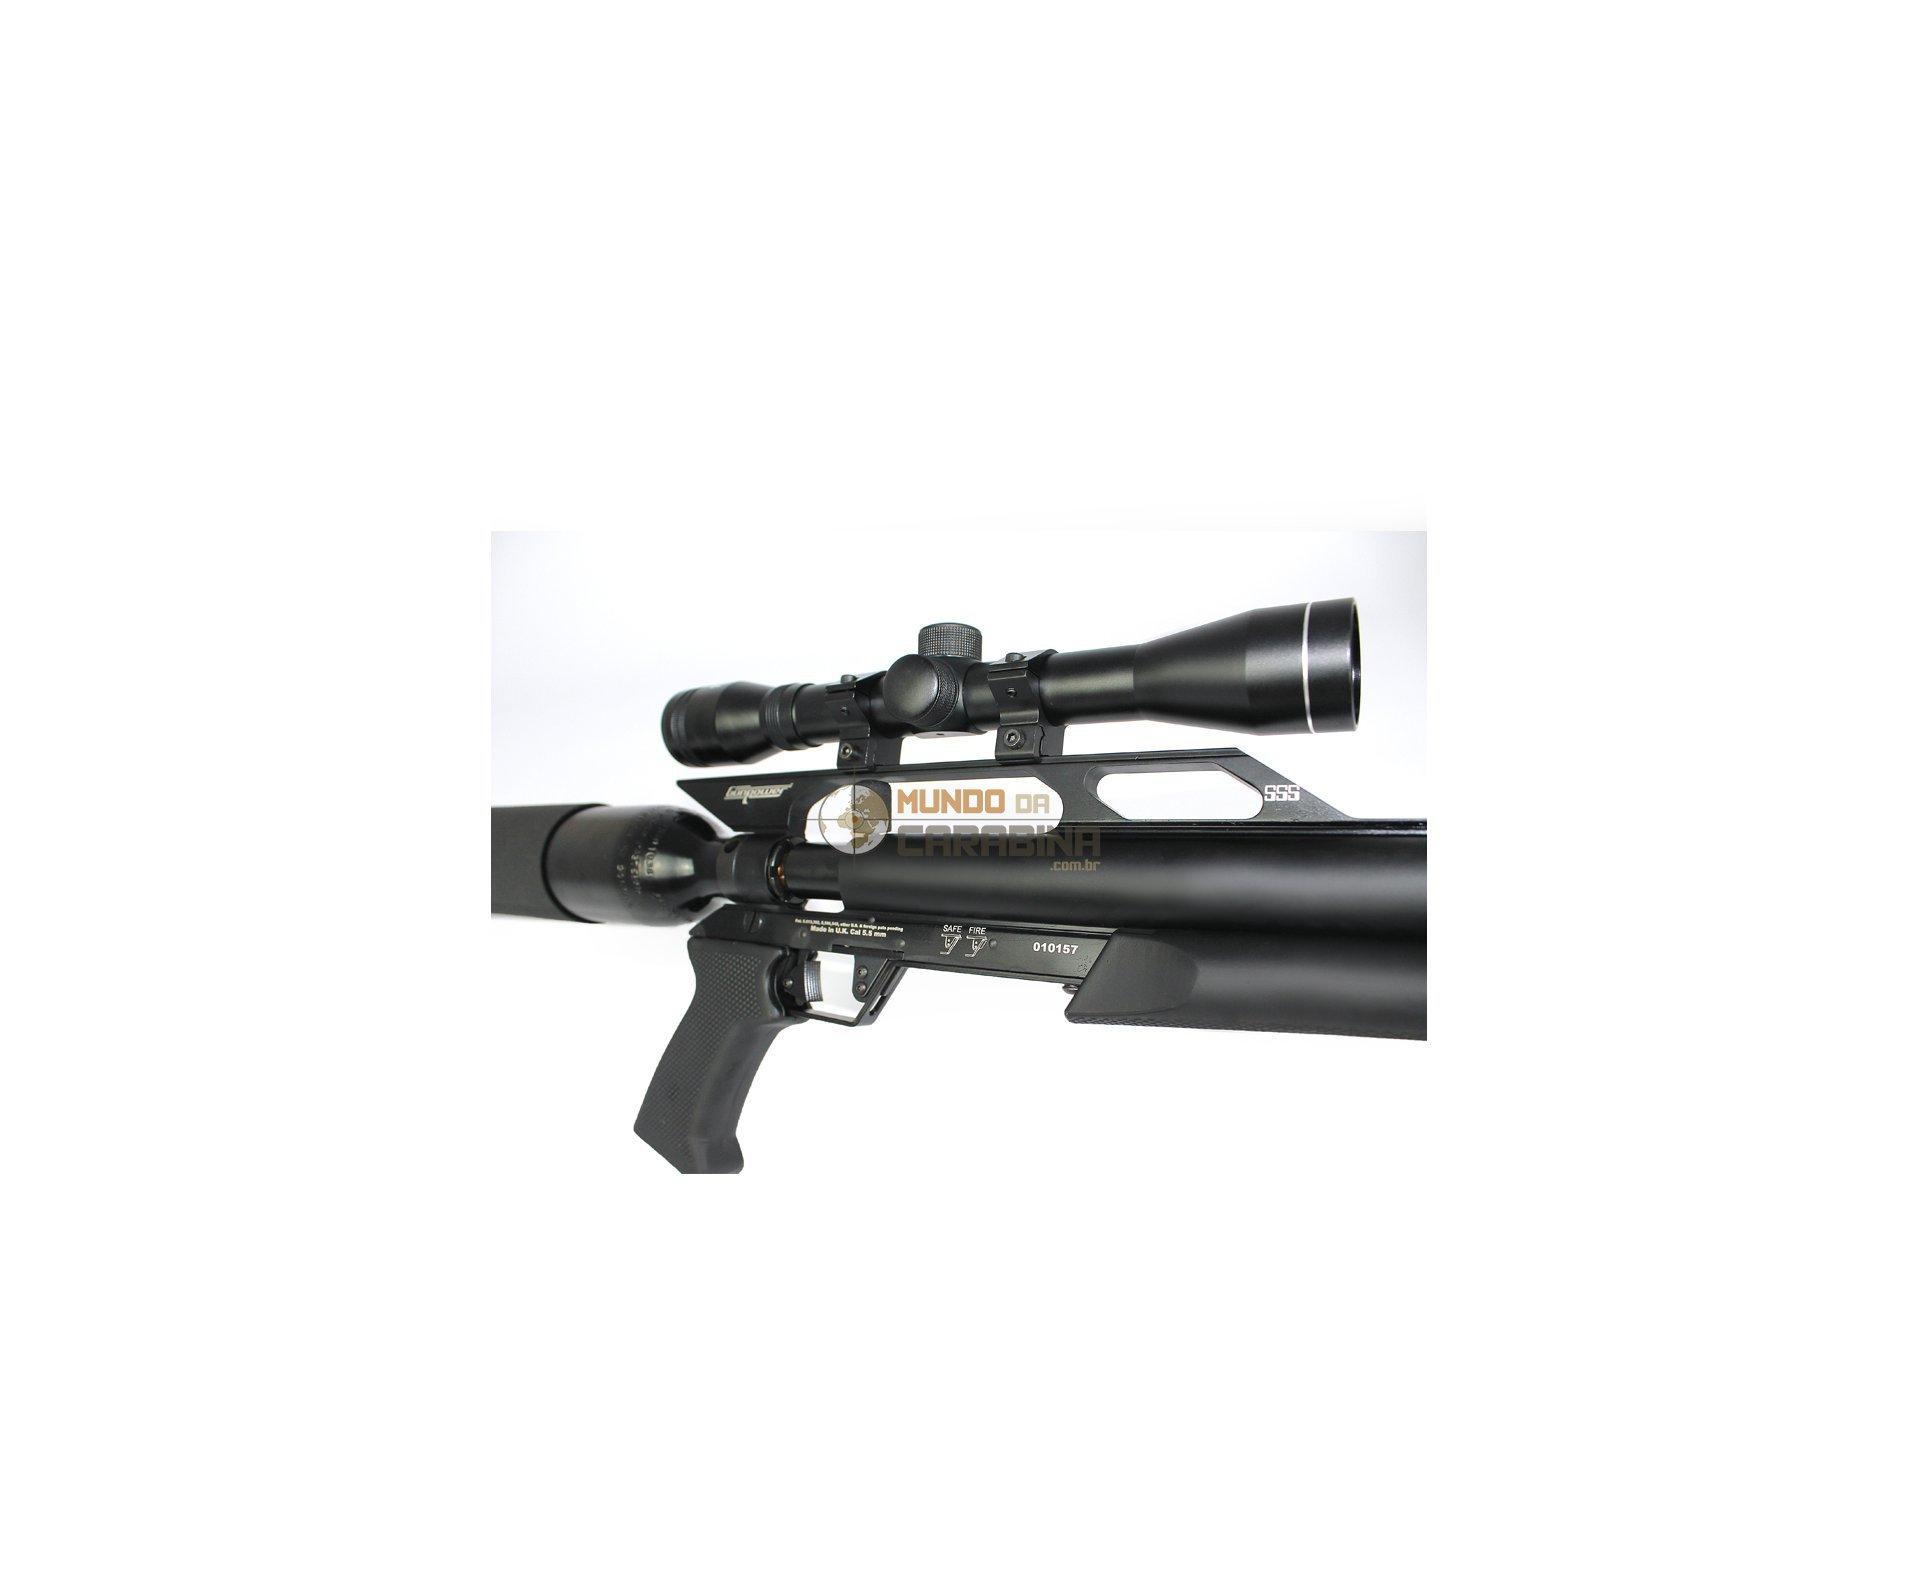 Rifle Pcp Gunpower Sss + Luneta 4x32 + Case Buffalo + Supressor + Bipé + Bandoleira Cal 5,5mm